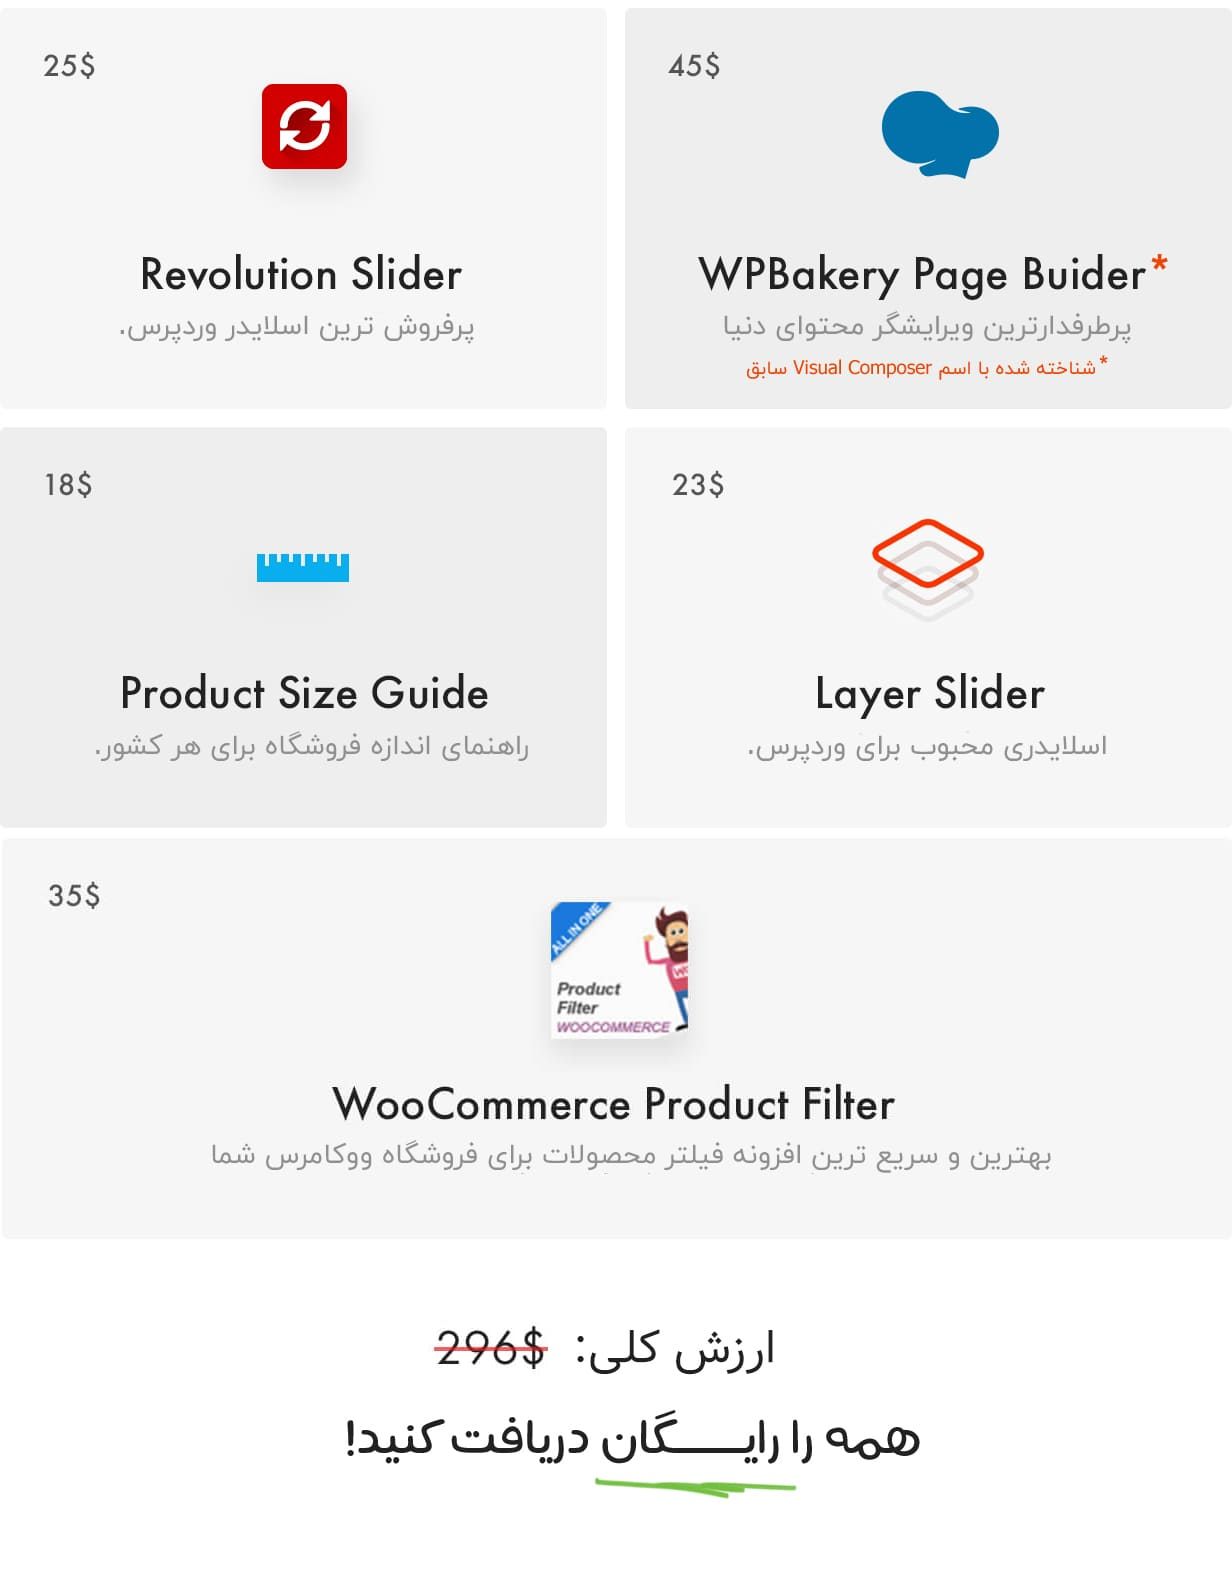 کالیوم همراه افزونه های wp bakery page builder ، اسلایدر رولوشن و لایر اسلایدر در قالب کالیوم